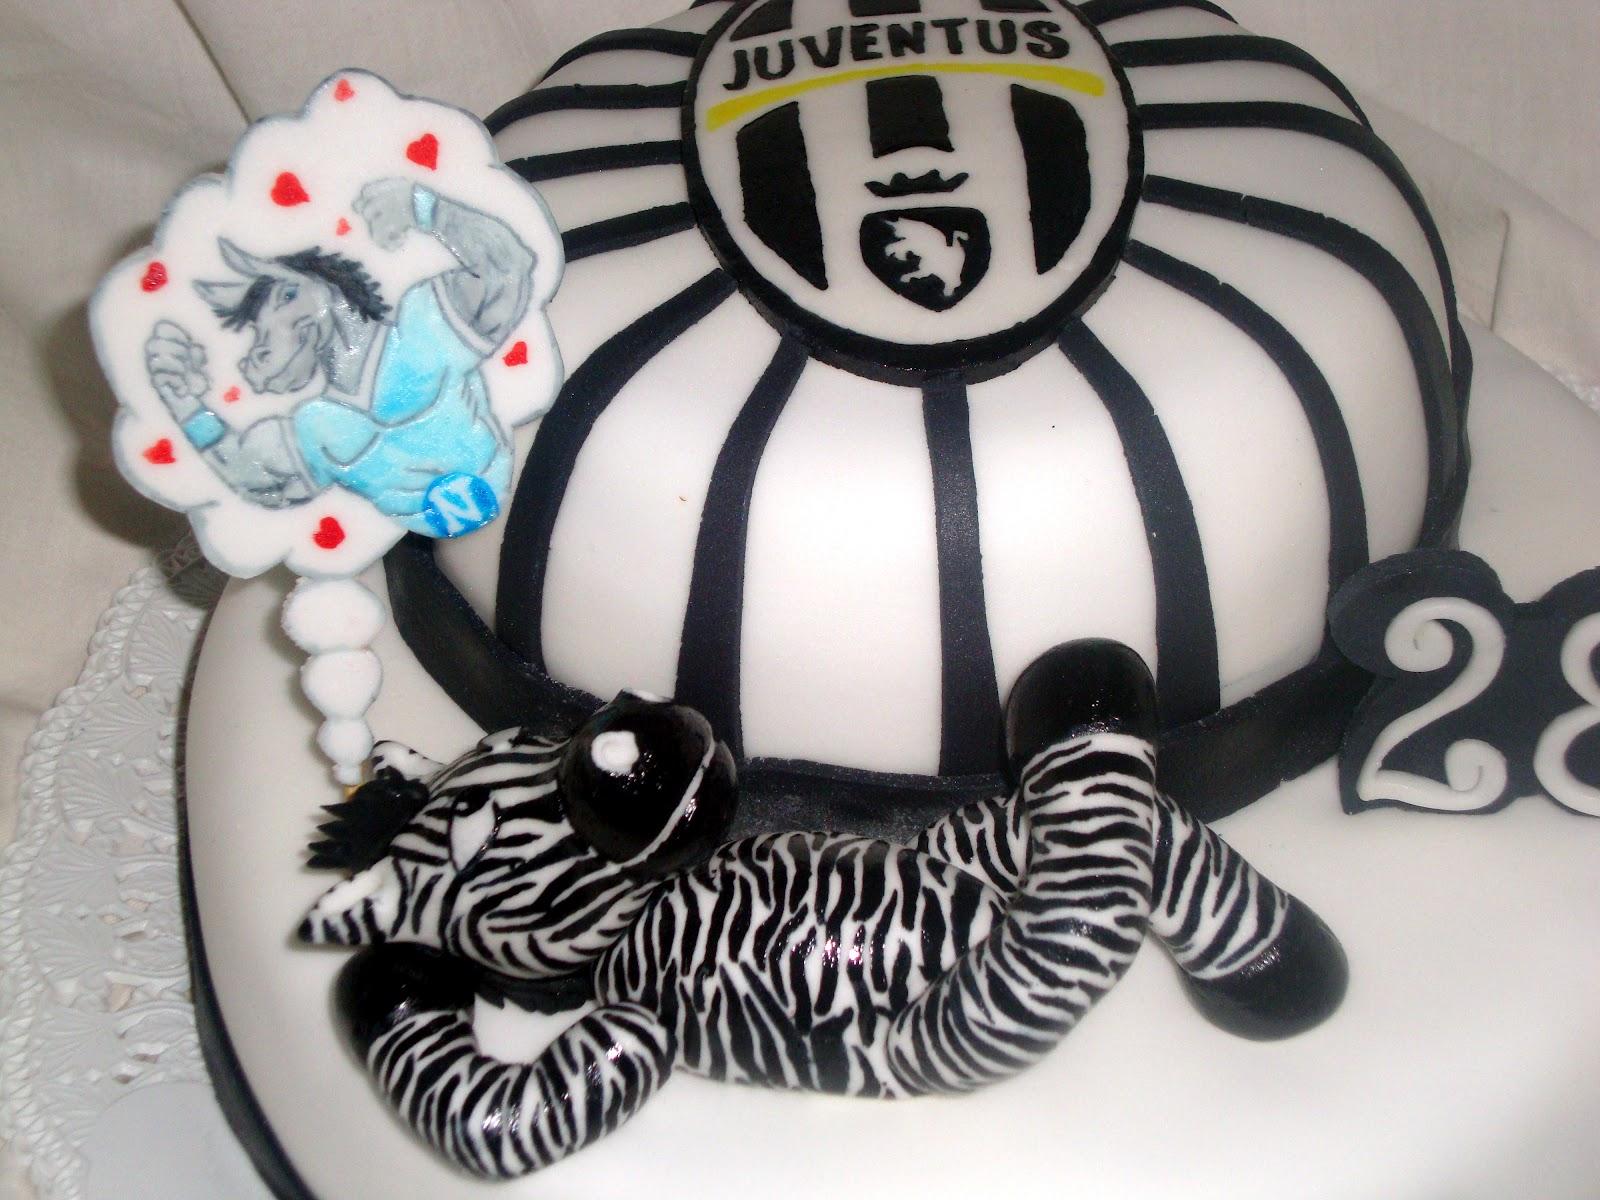 decorazioni torte juventus: very's cake: zebra juve beffarda. una ... - Decorazioni Torte Juventus